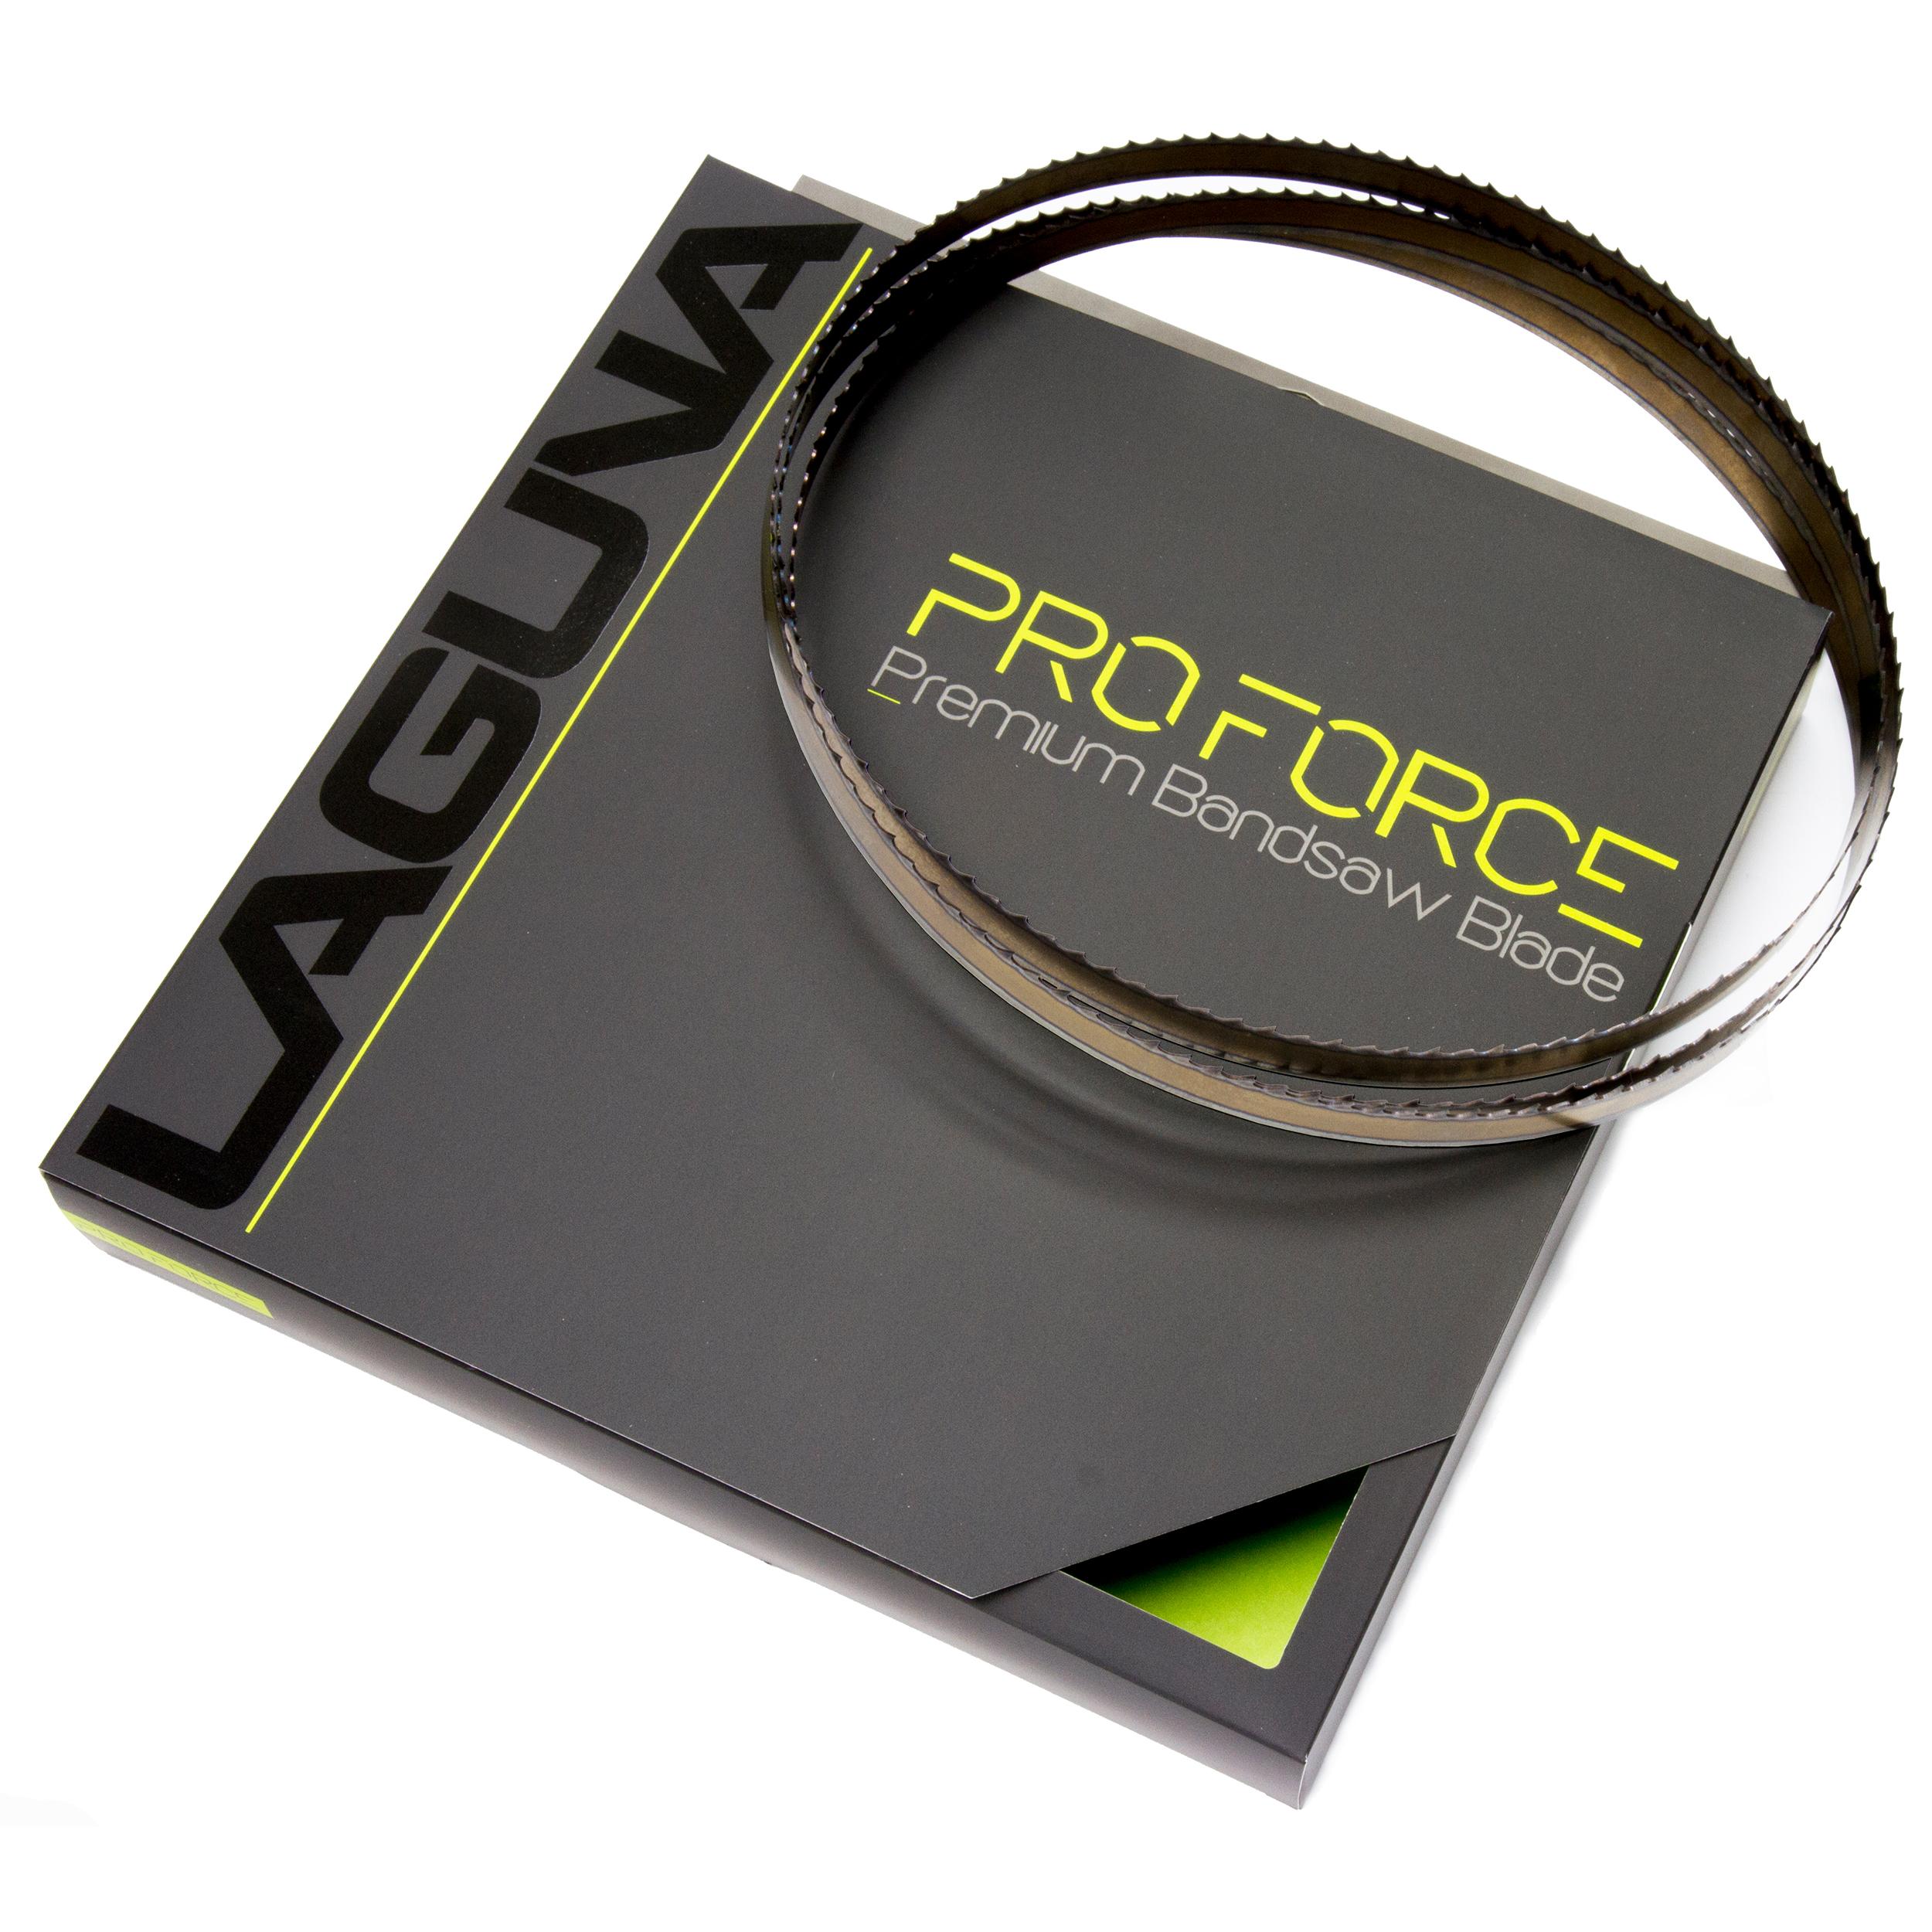 Pro Force 1 / 2